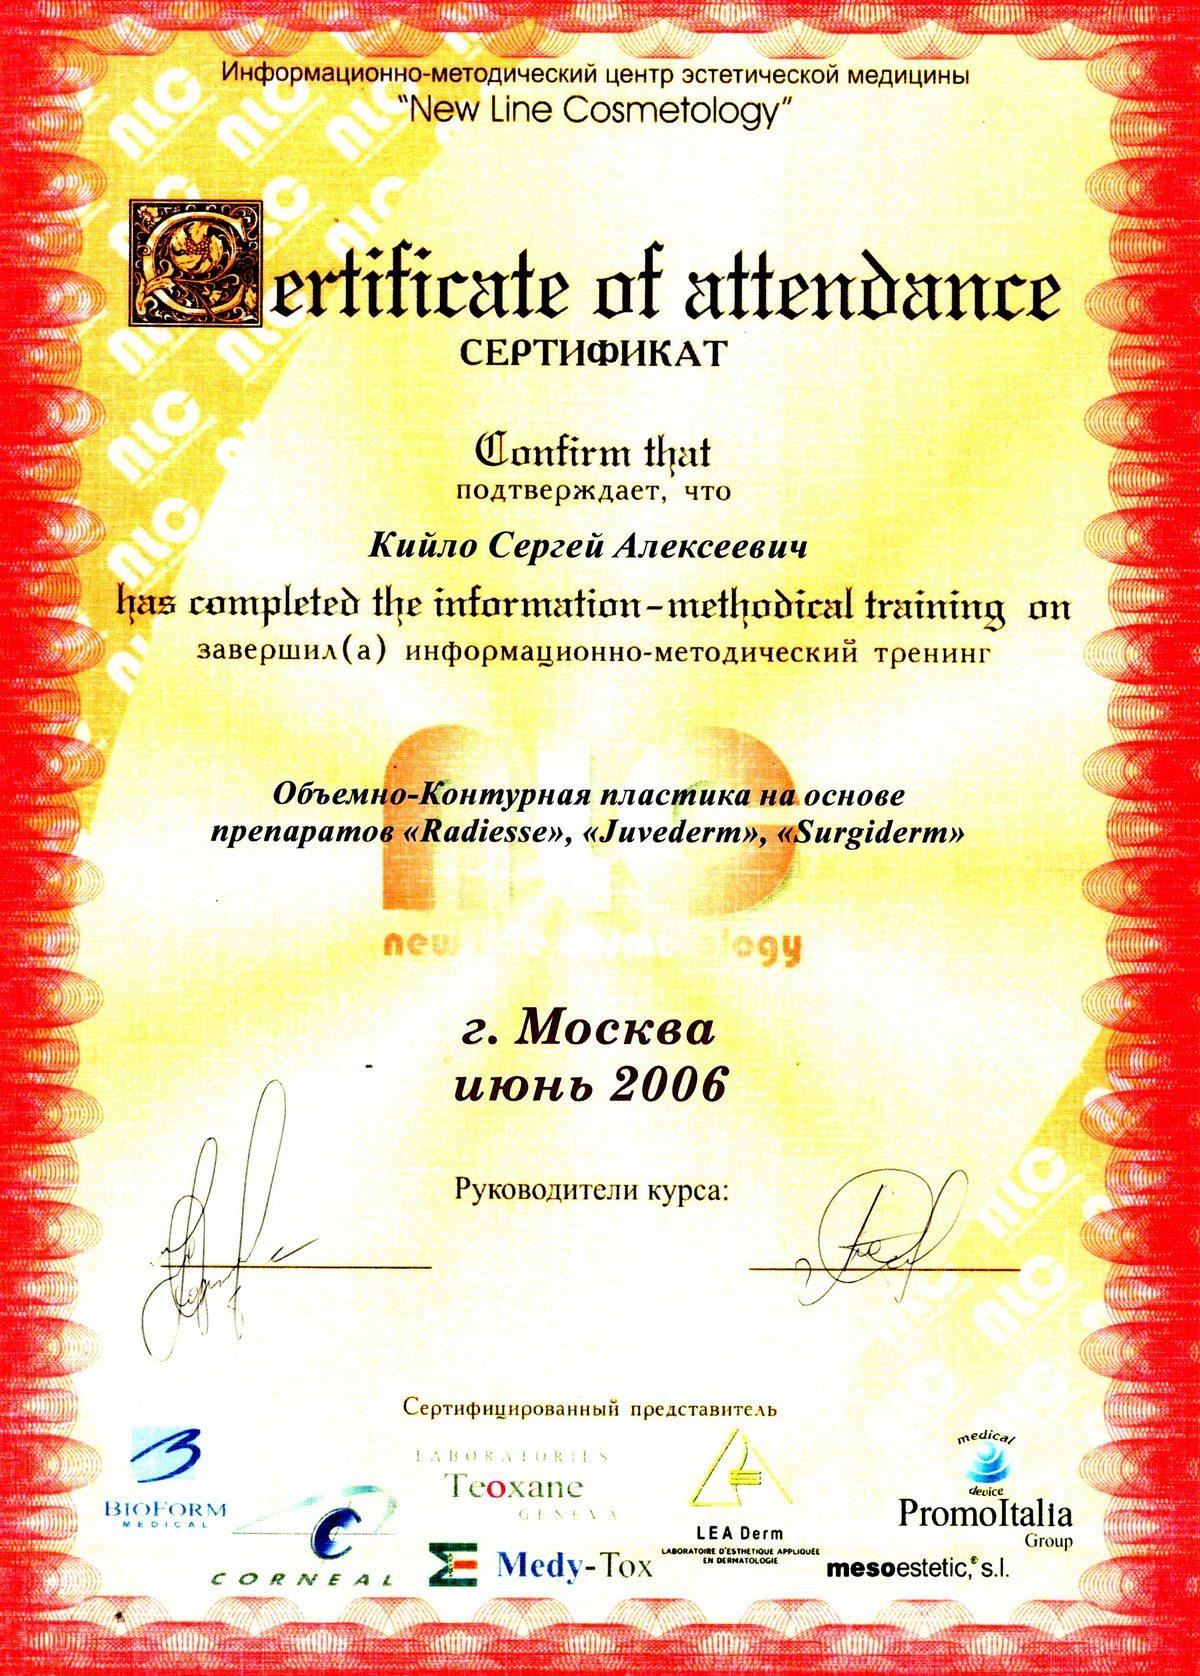 Документ №:38 Сертификат пластического хирурга Кийло Сергея Алексеевича